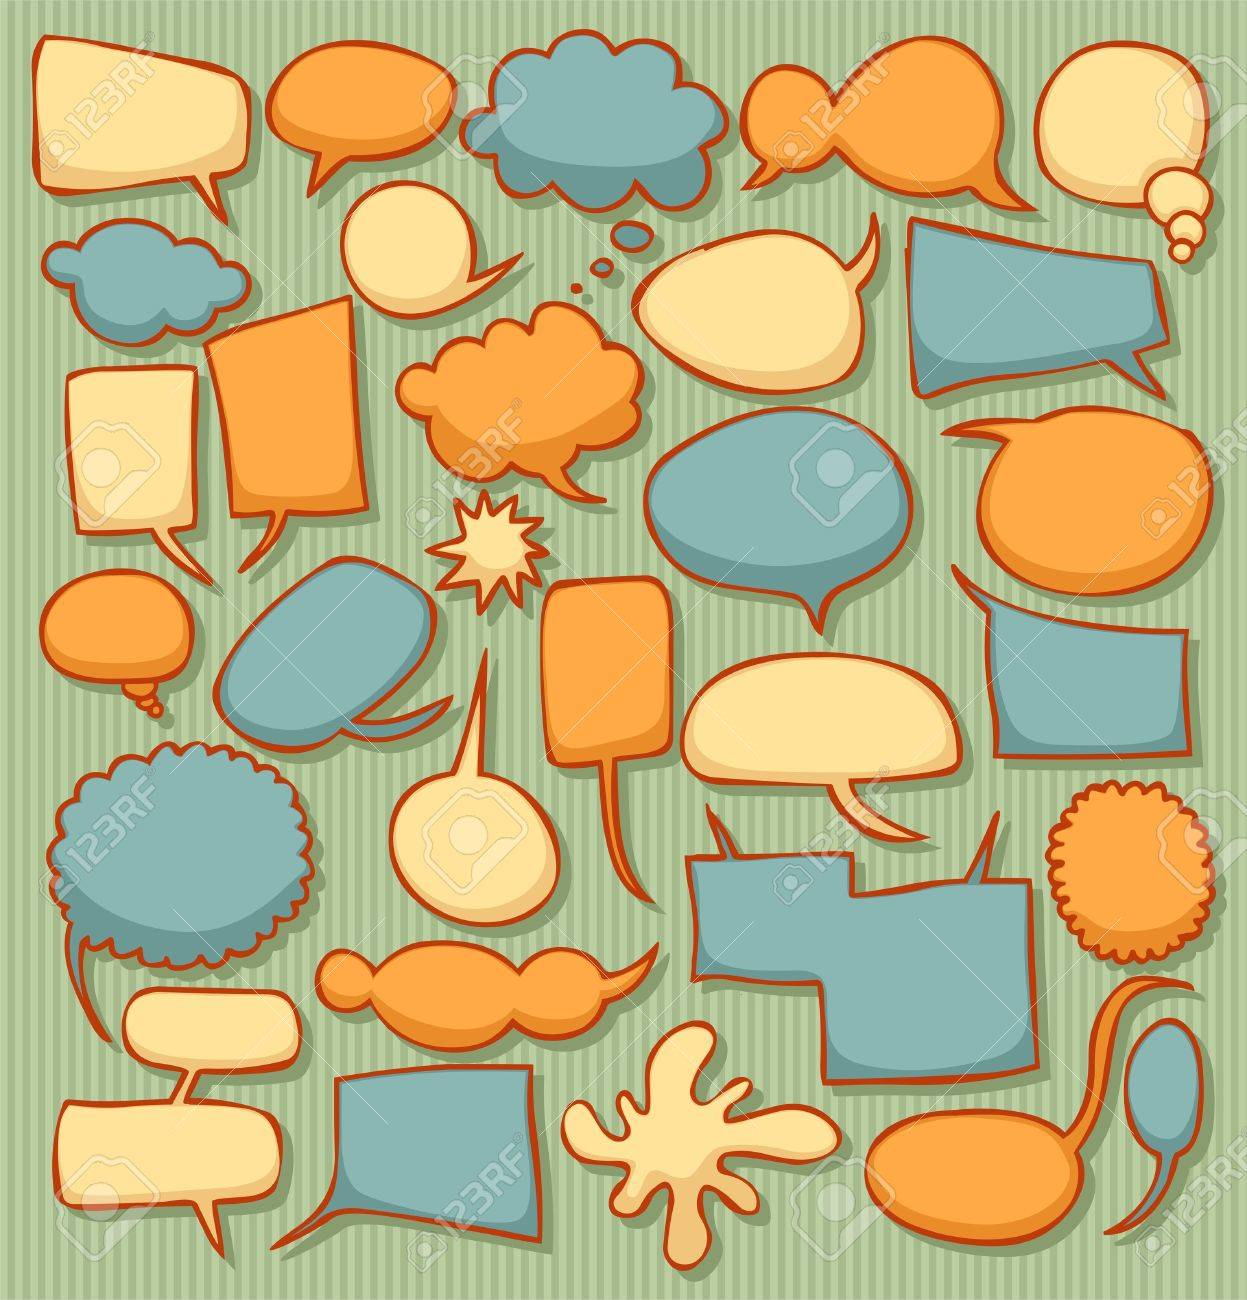 Colorful retro speech bubble collection Stock Vector - 12496667